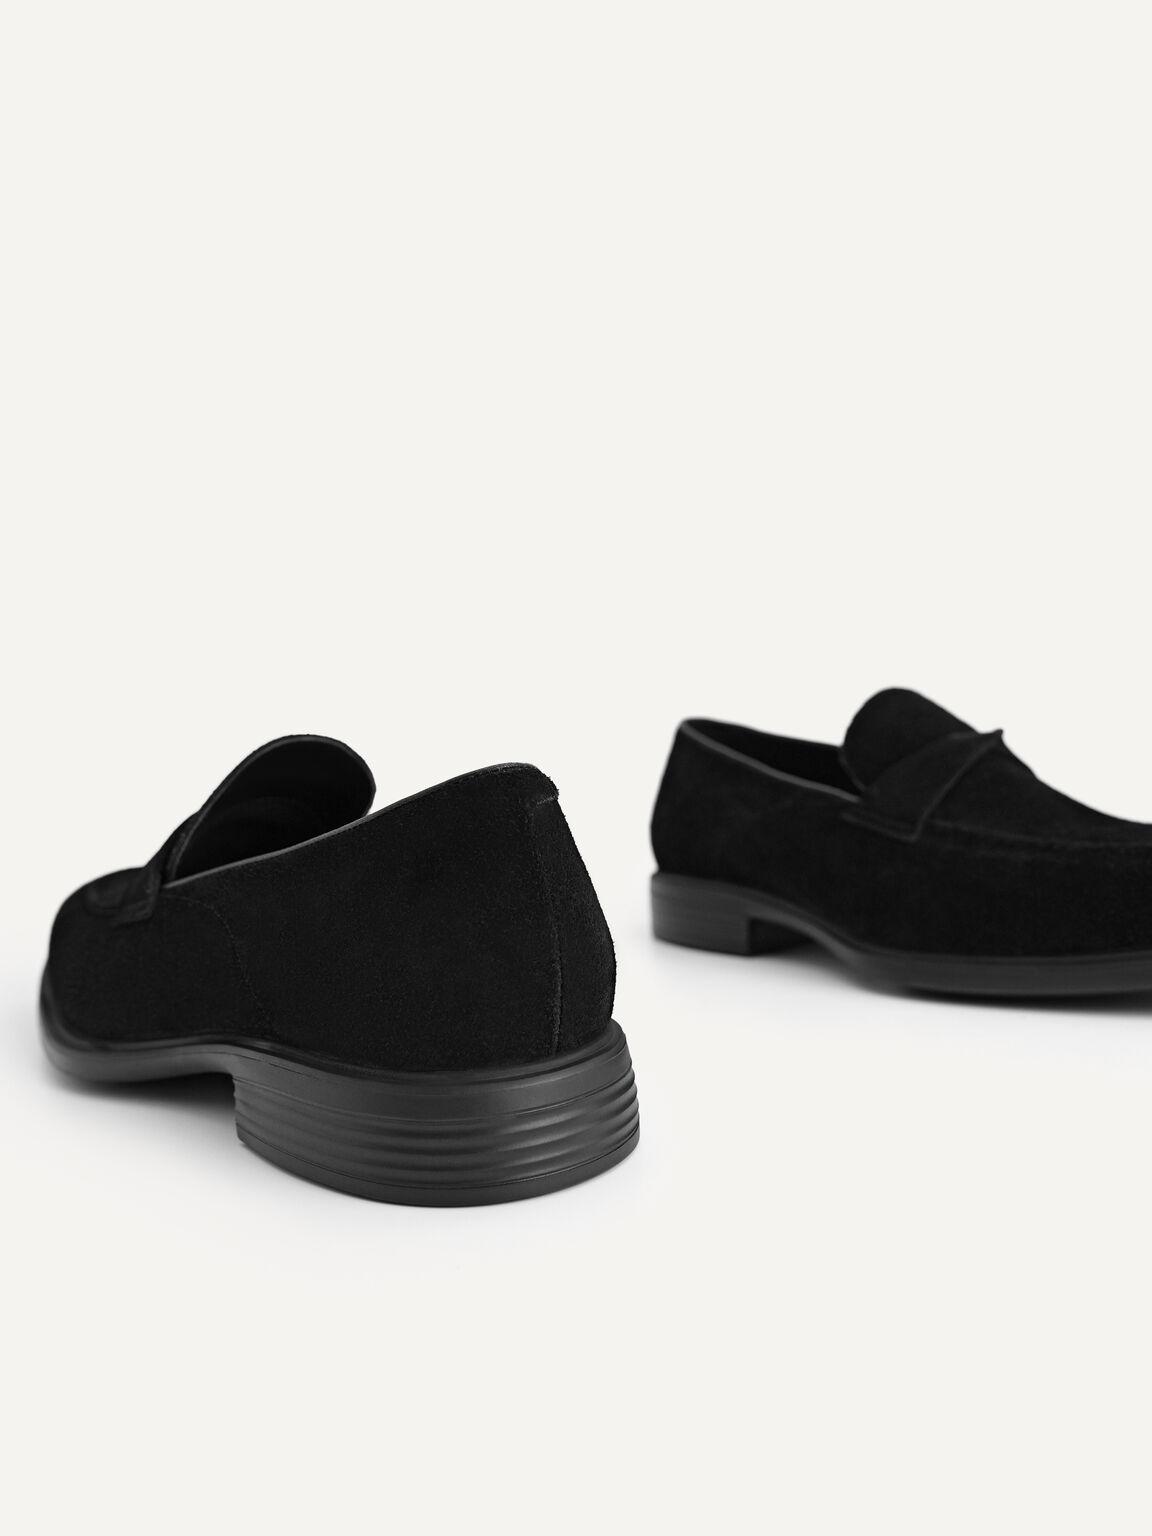 Altitude Leather Loafers, Black, hi-res